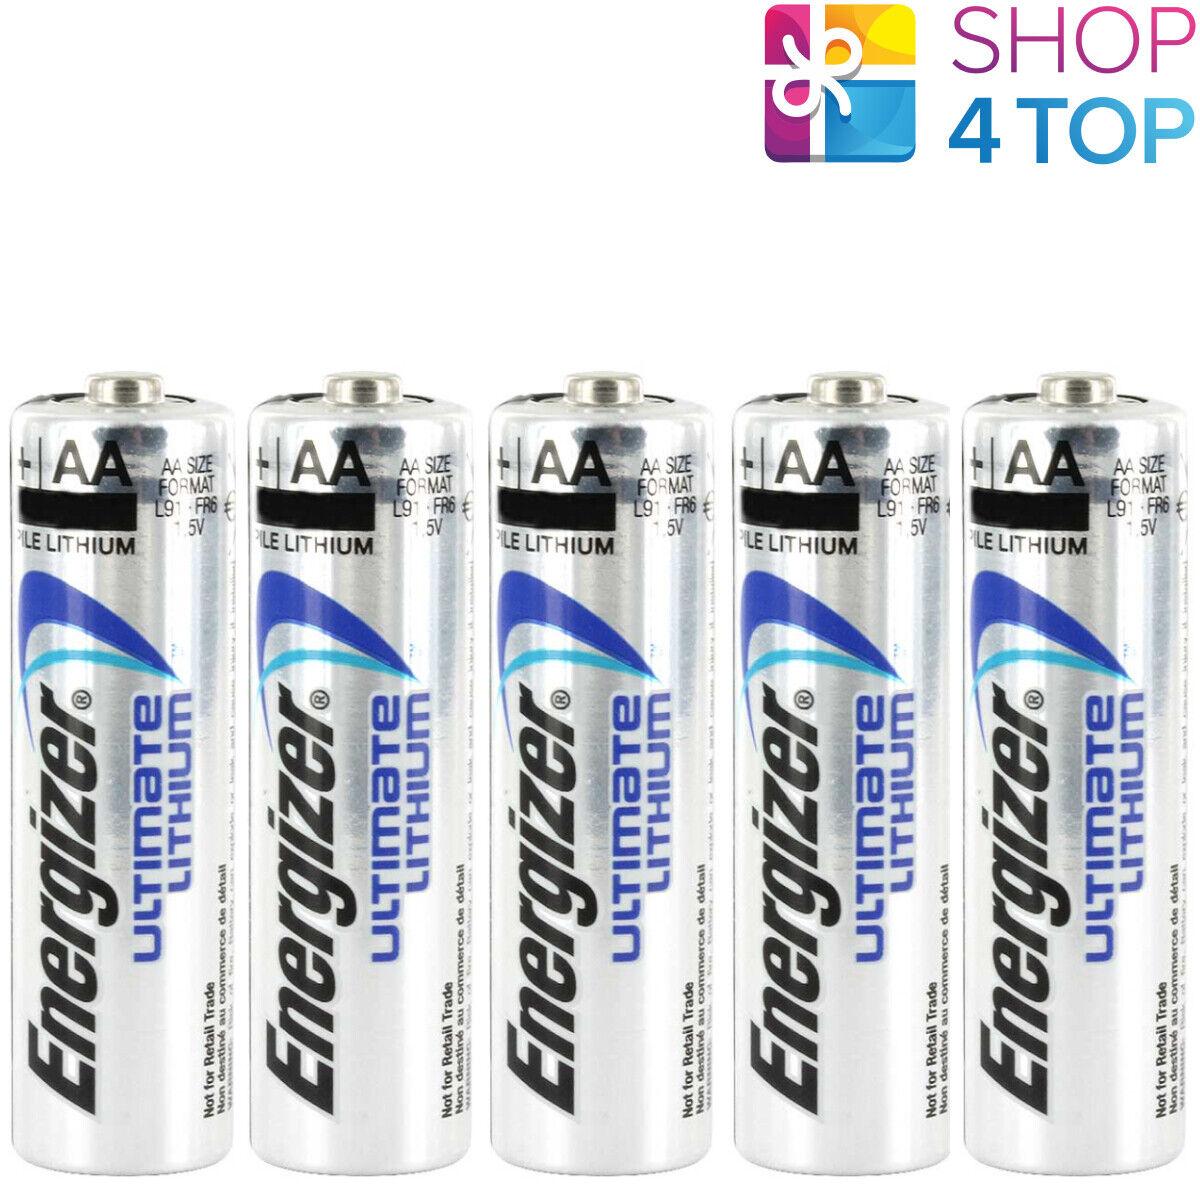 5 Energizer AA Ultimate Lithium L91 Batteries 1.5V Mignon Stilo LR6 NEW